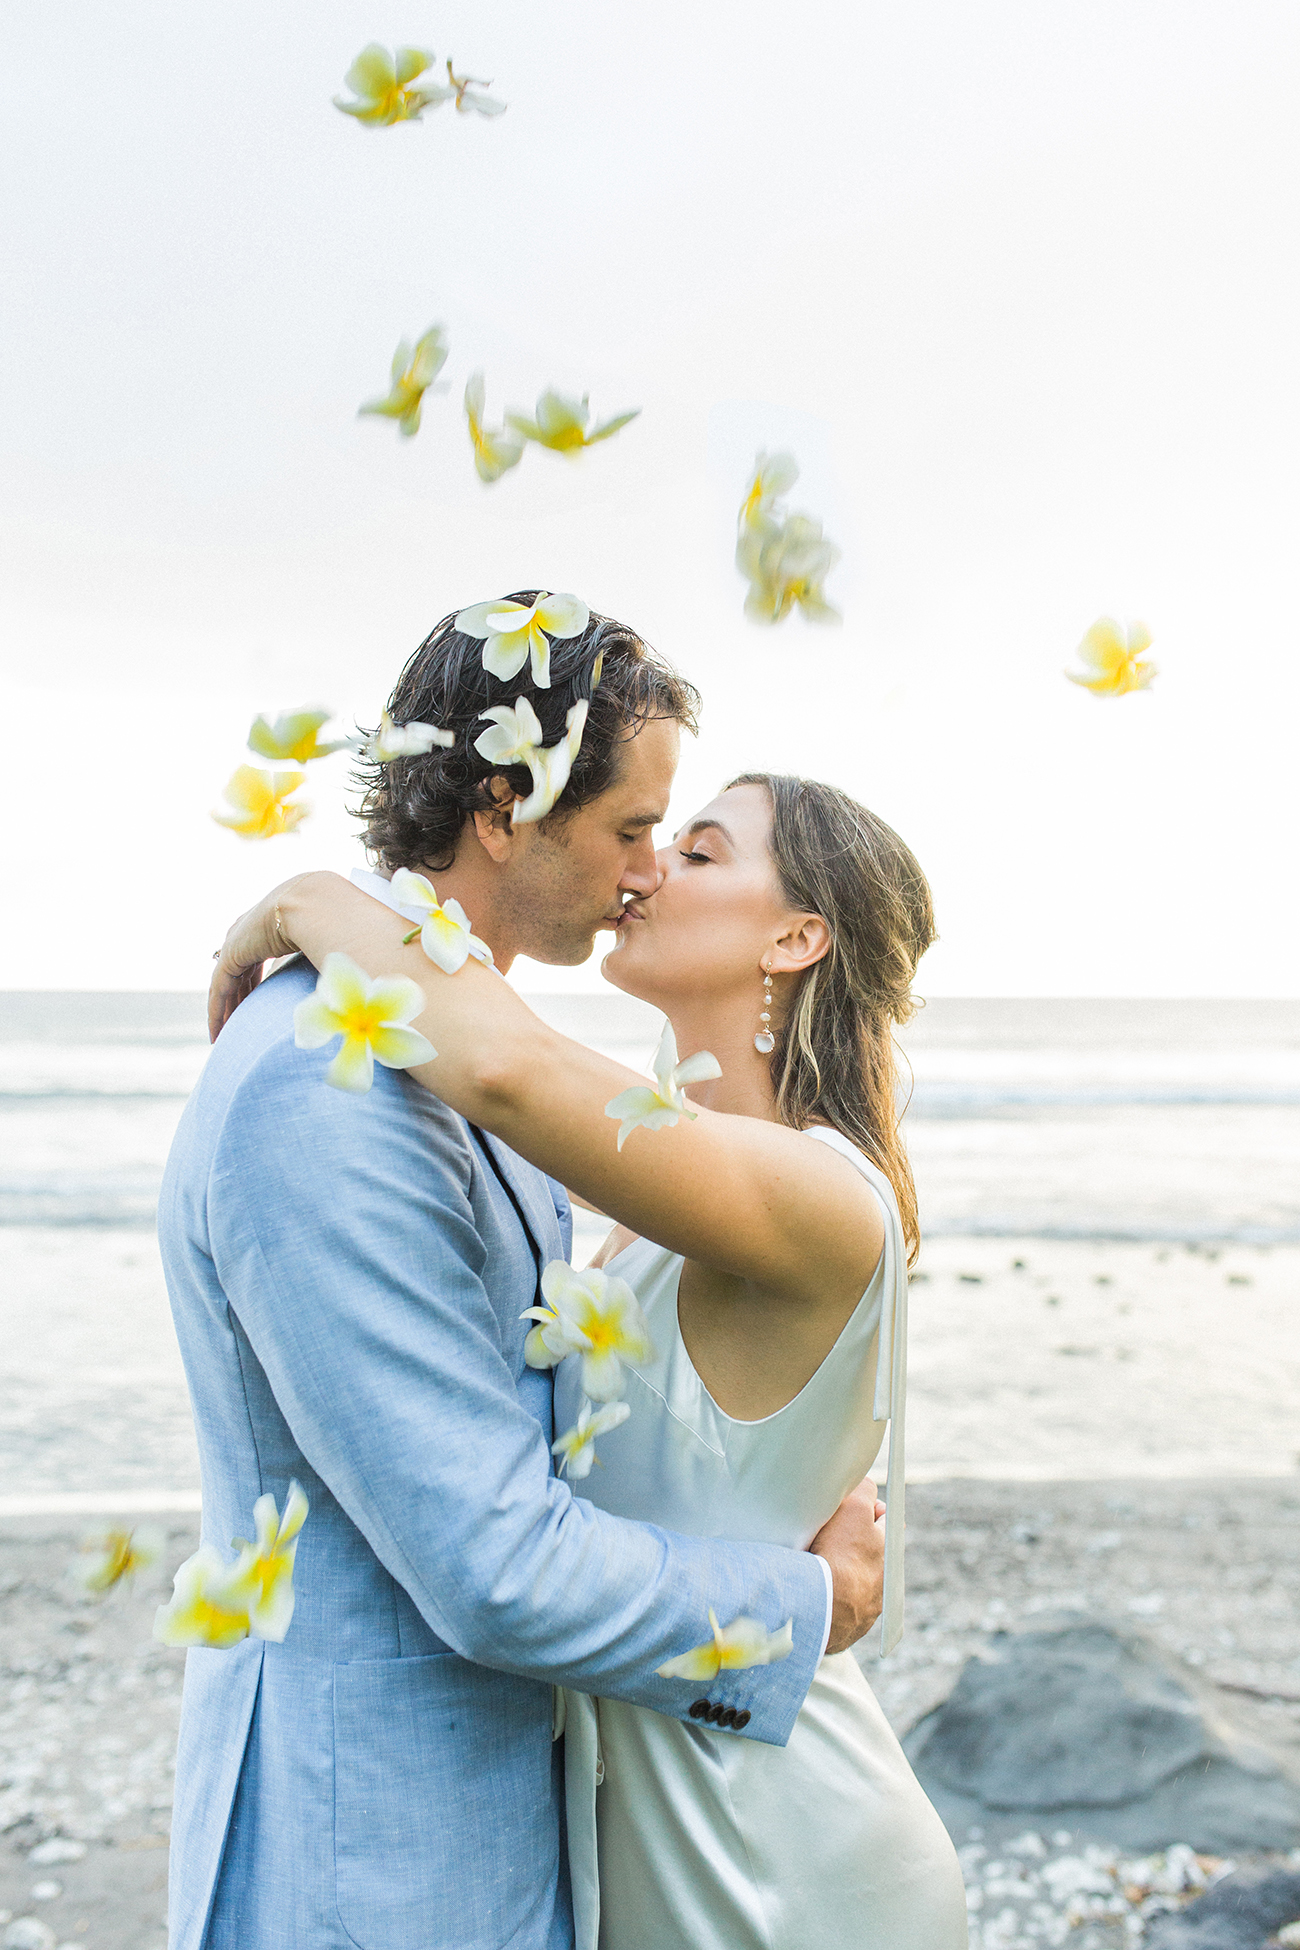 Hawaii newlyweds by Sarah Ellefson Photography